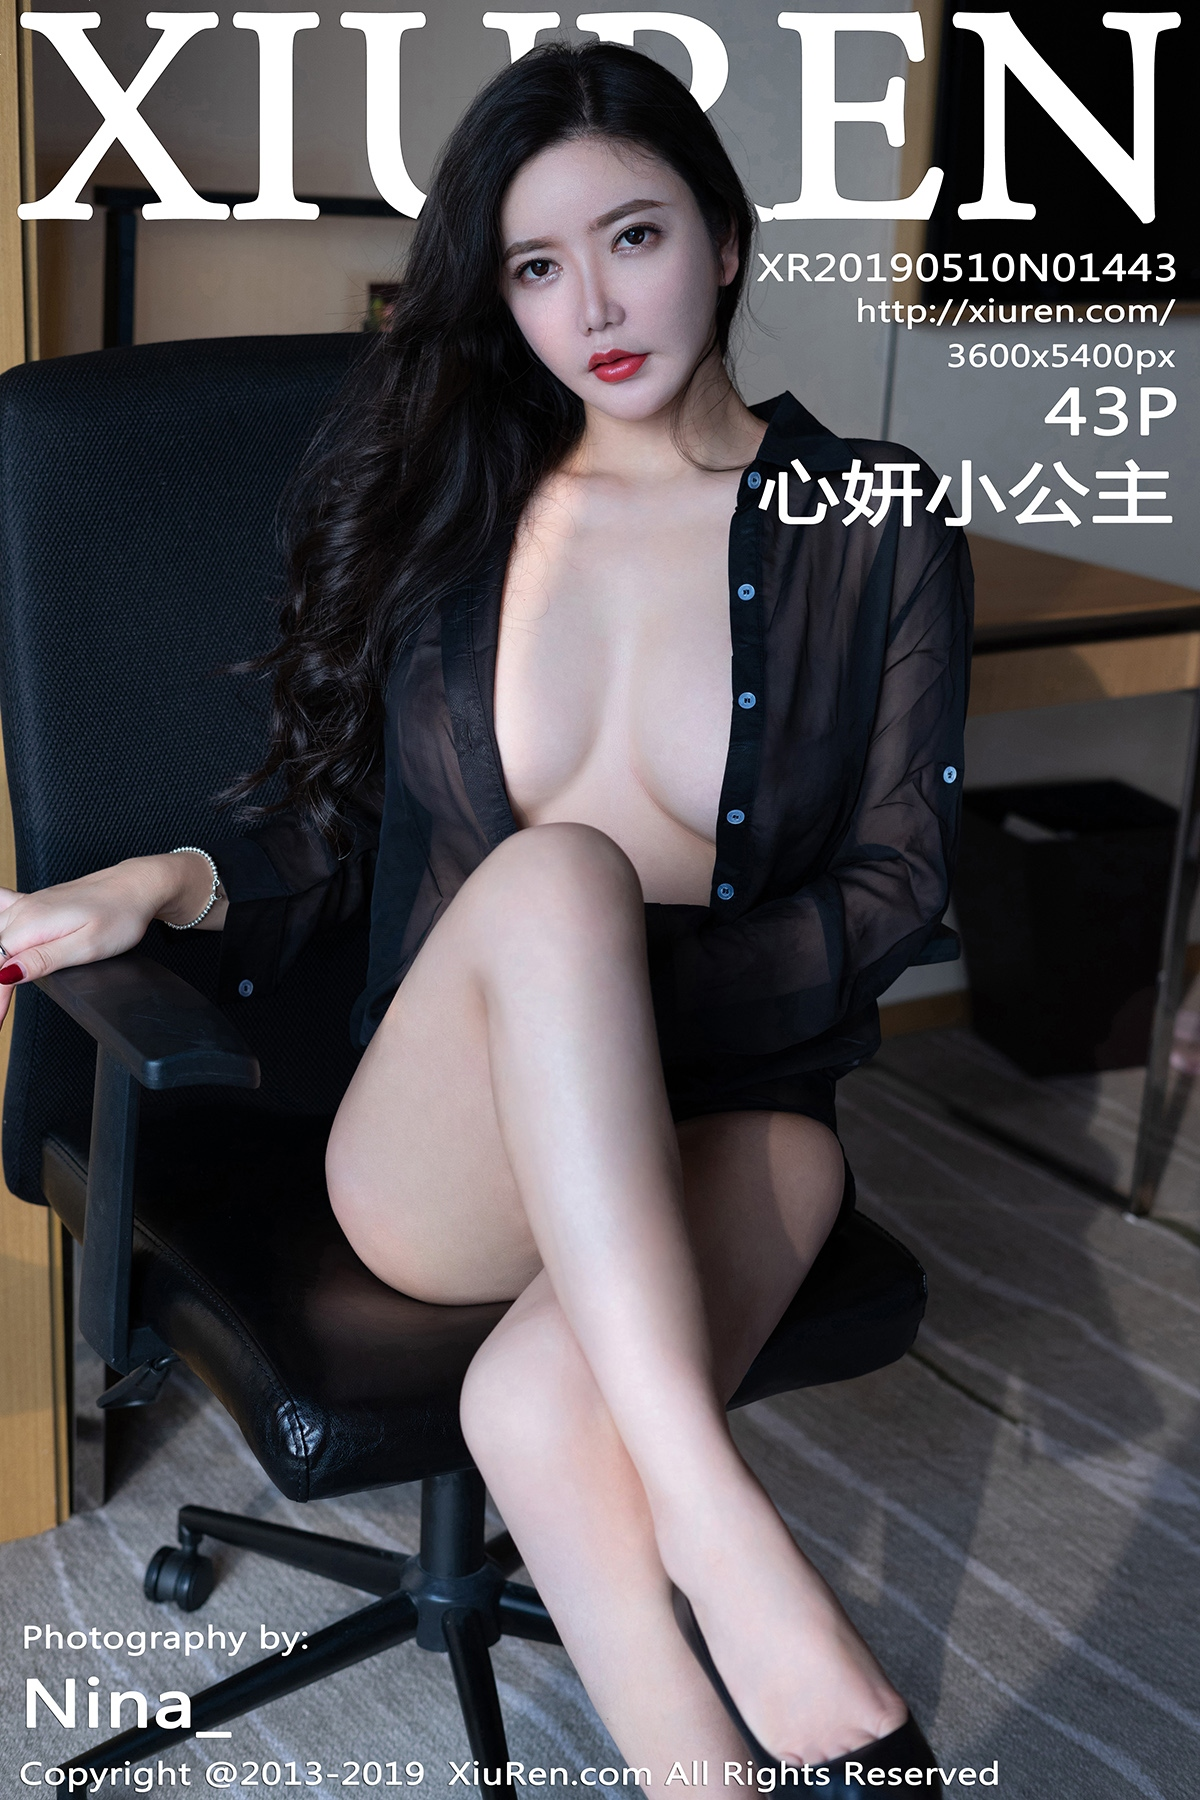 [XiuRen秀人网]2019.05.10 No.1443 心妍小公主 巨乳 圣光[/178MB]